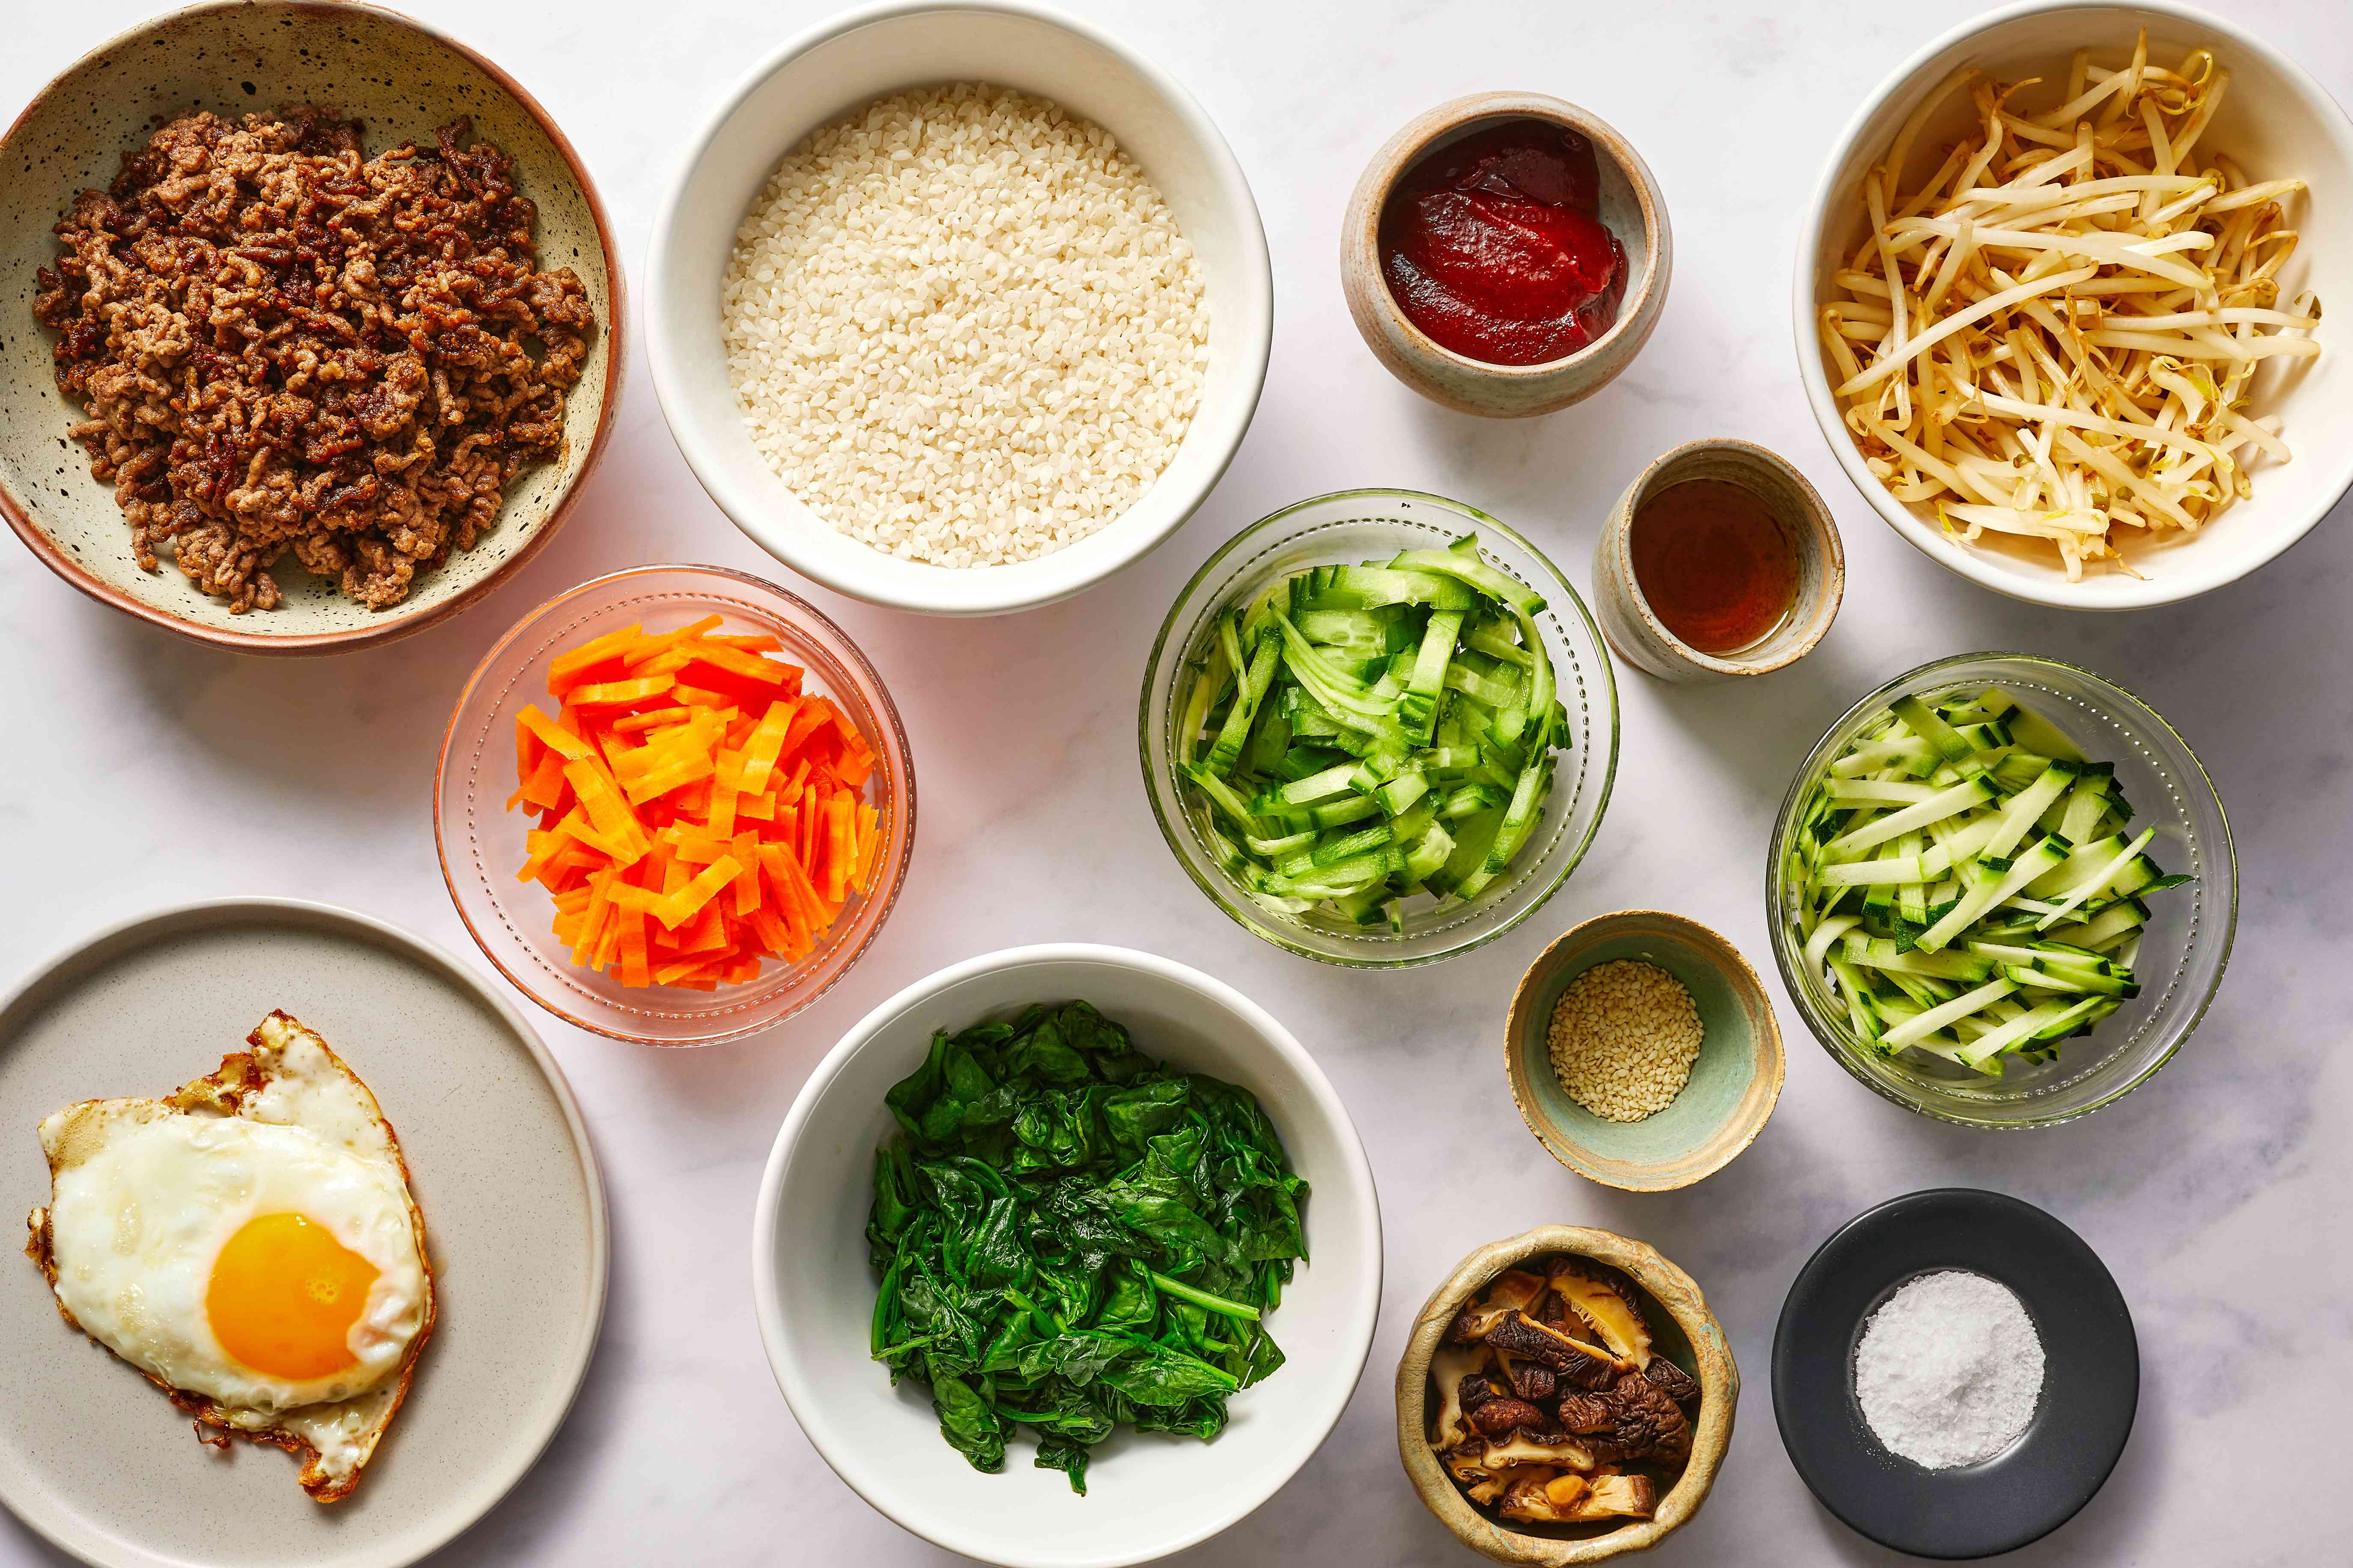 Classic Korean Bibimbap ingredients